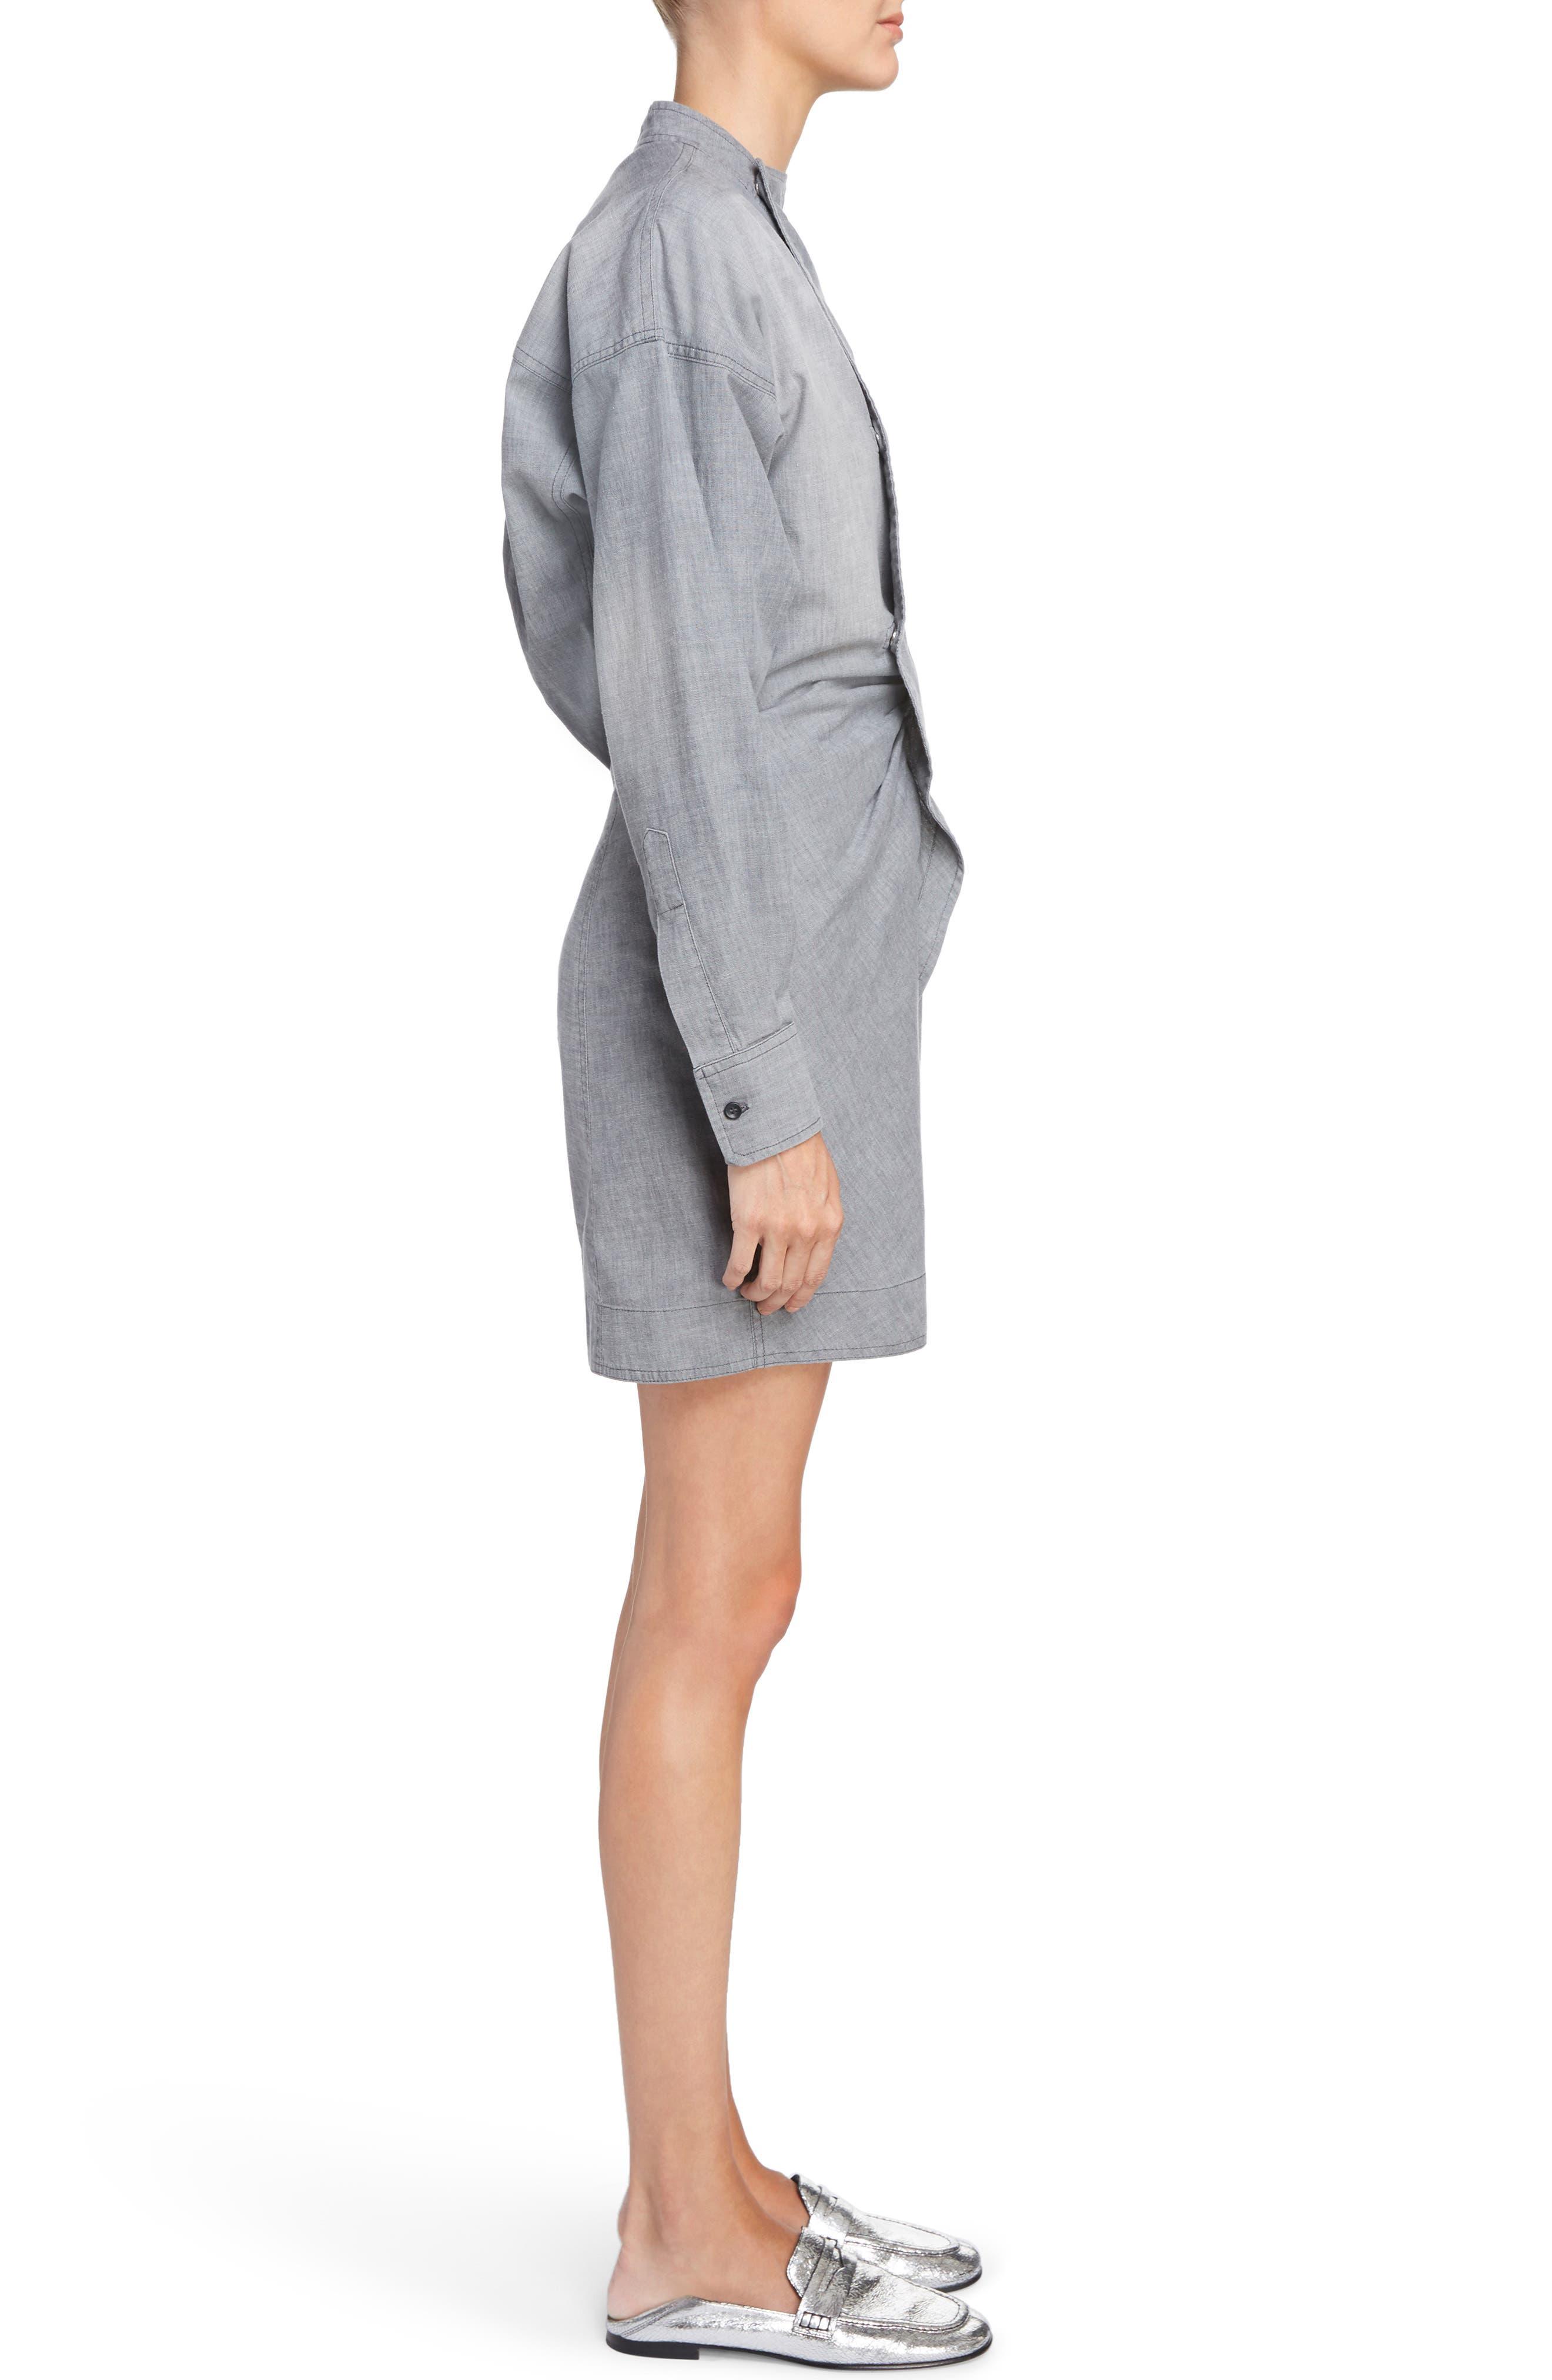 Isabel Marant Étoile Lindsey Chambray Dress,                             Alternate thumbnail 3, color,                             020